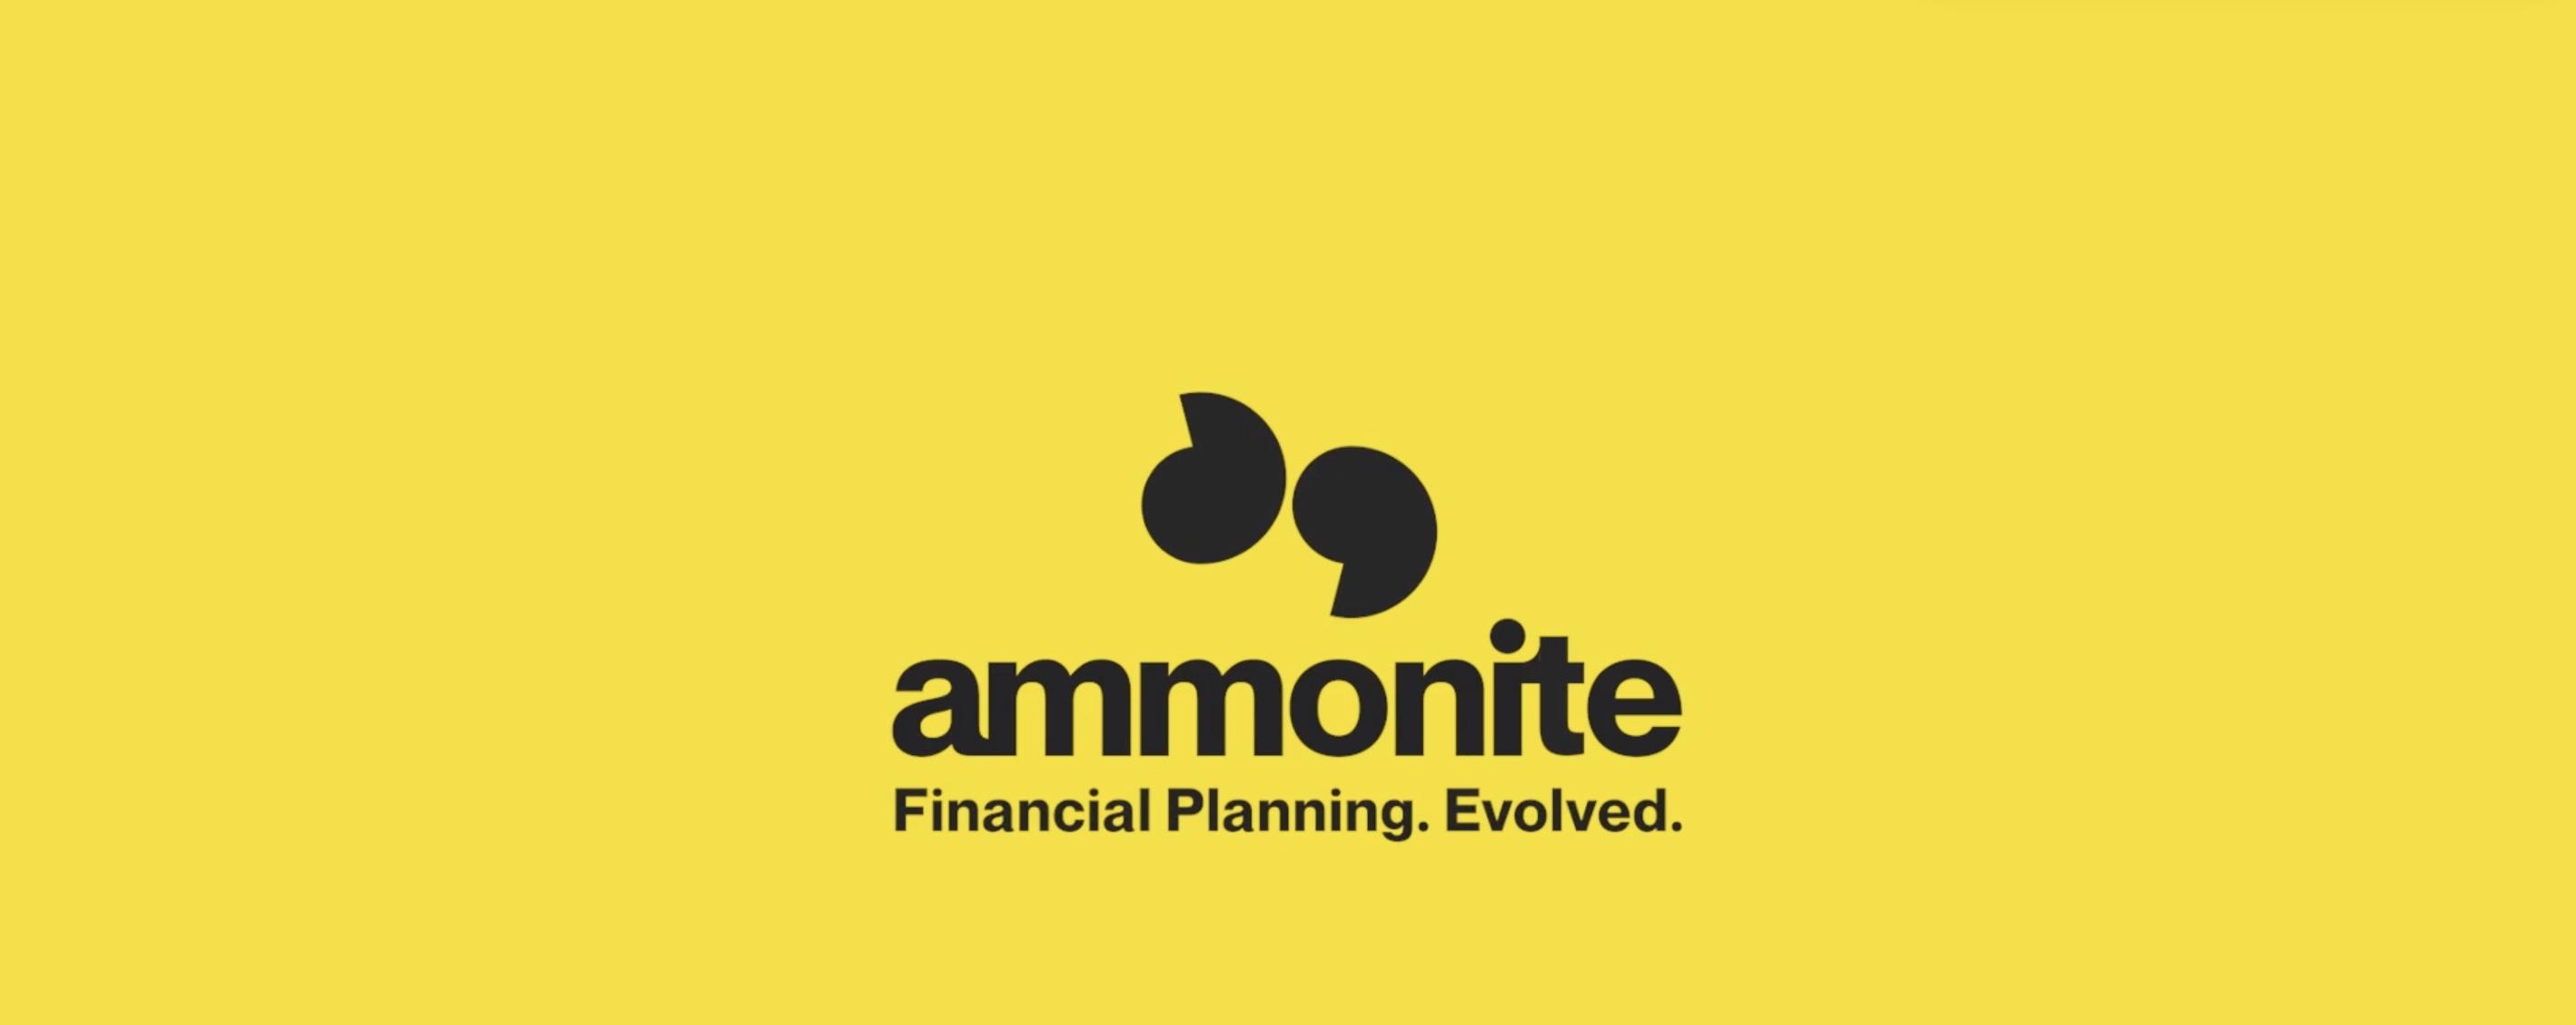 Ammonite in 60 seconds Video